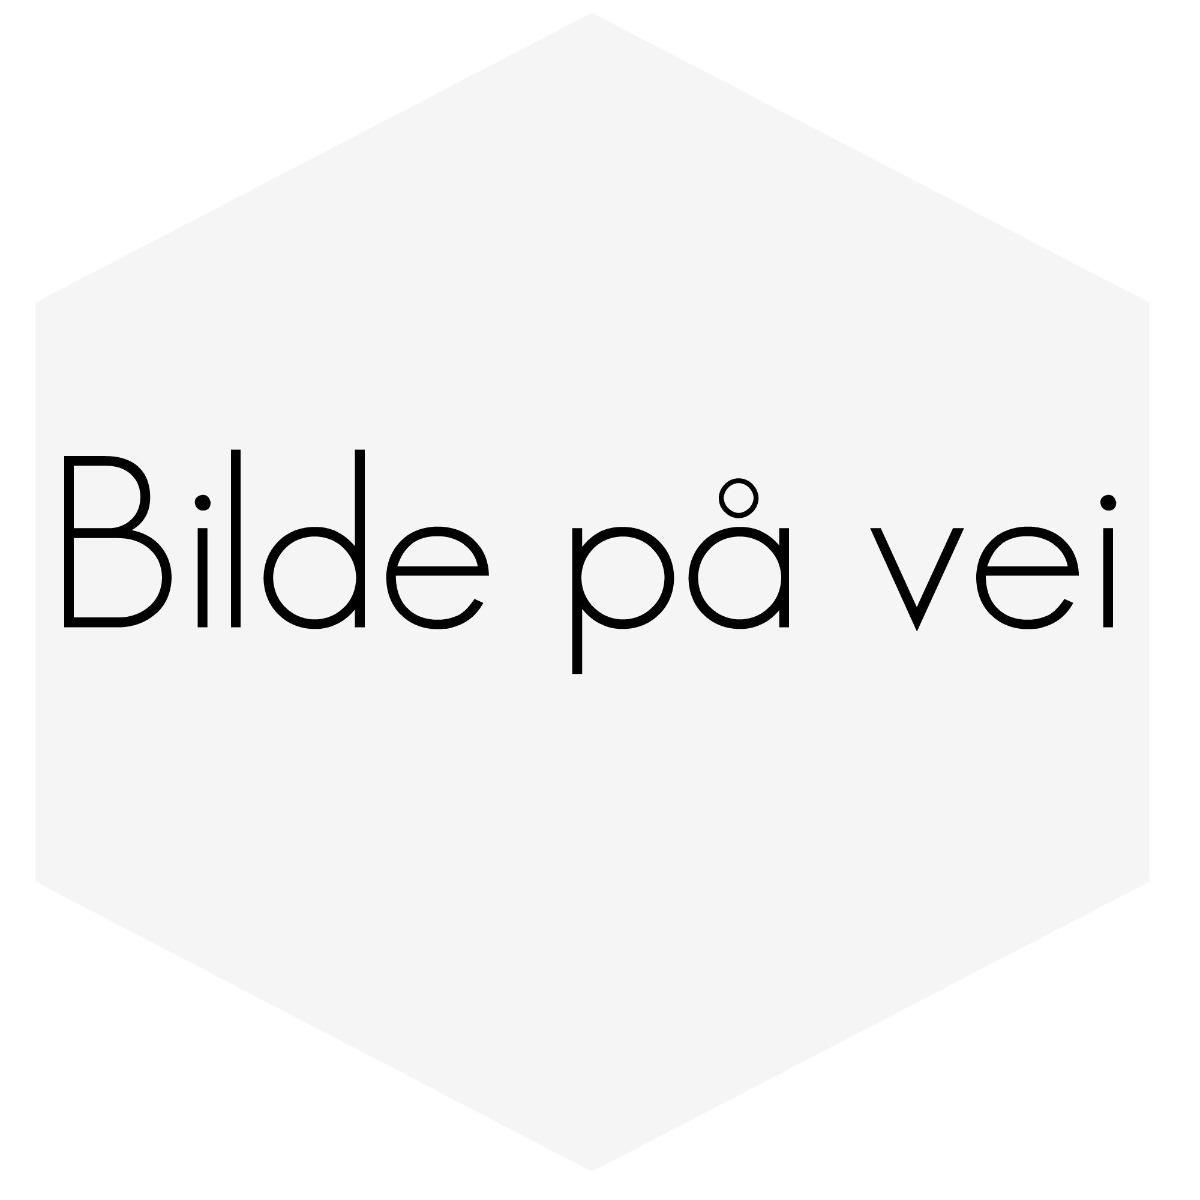 SPOILER / VINGE BAK 850 SEDAN (854) M/BREMSELYS